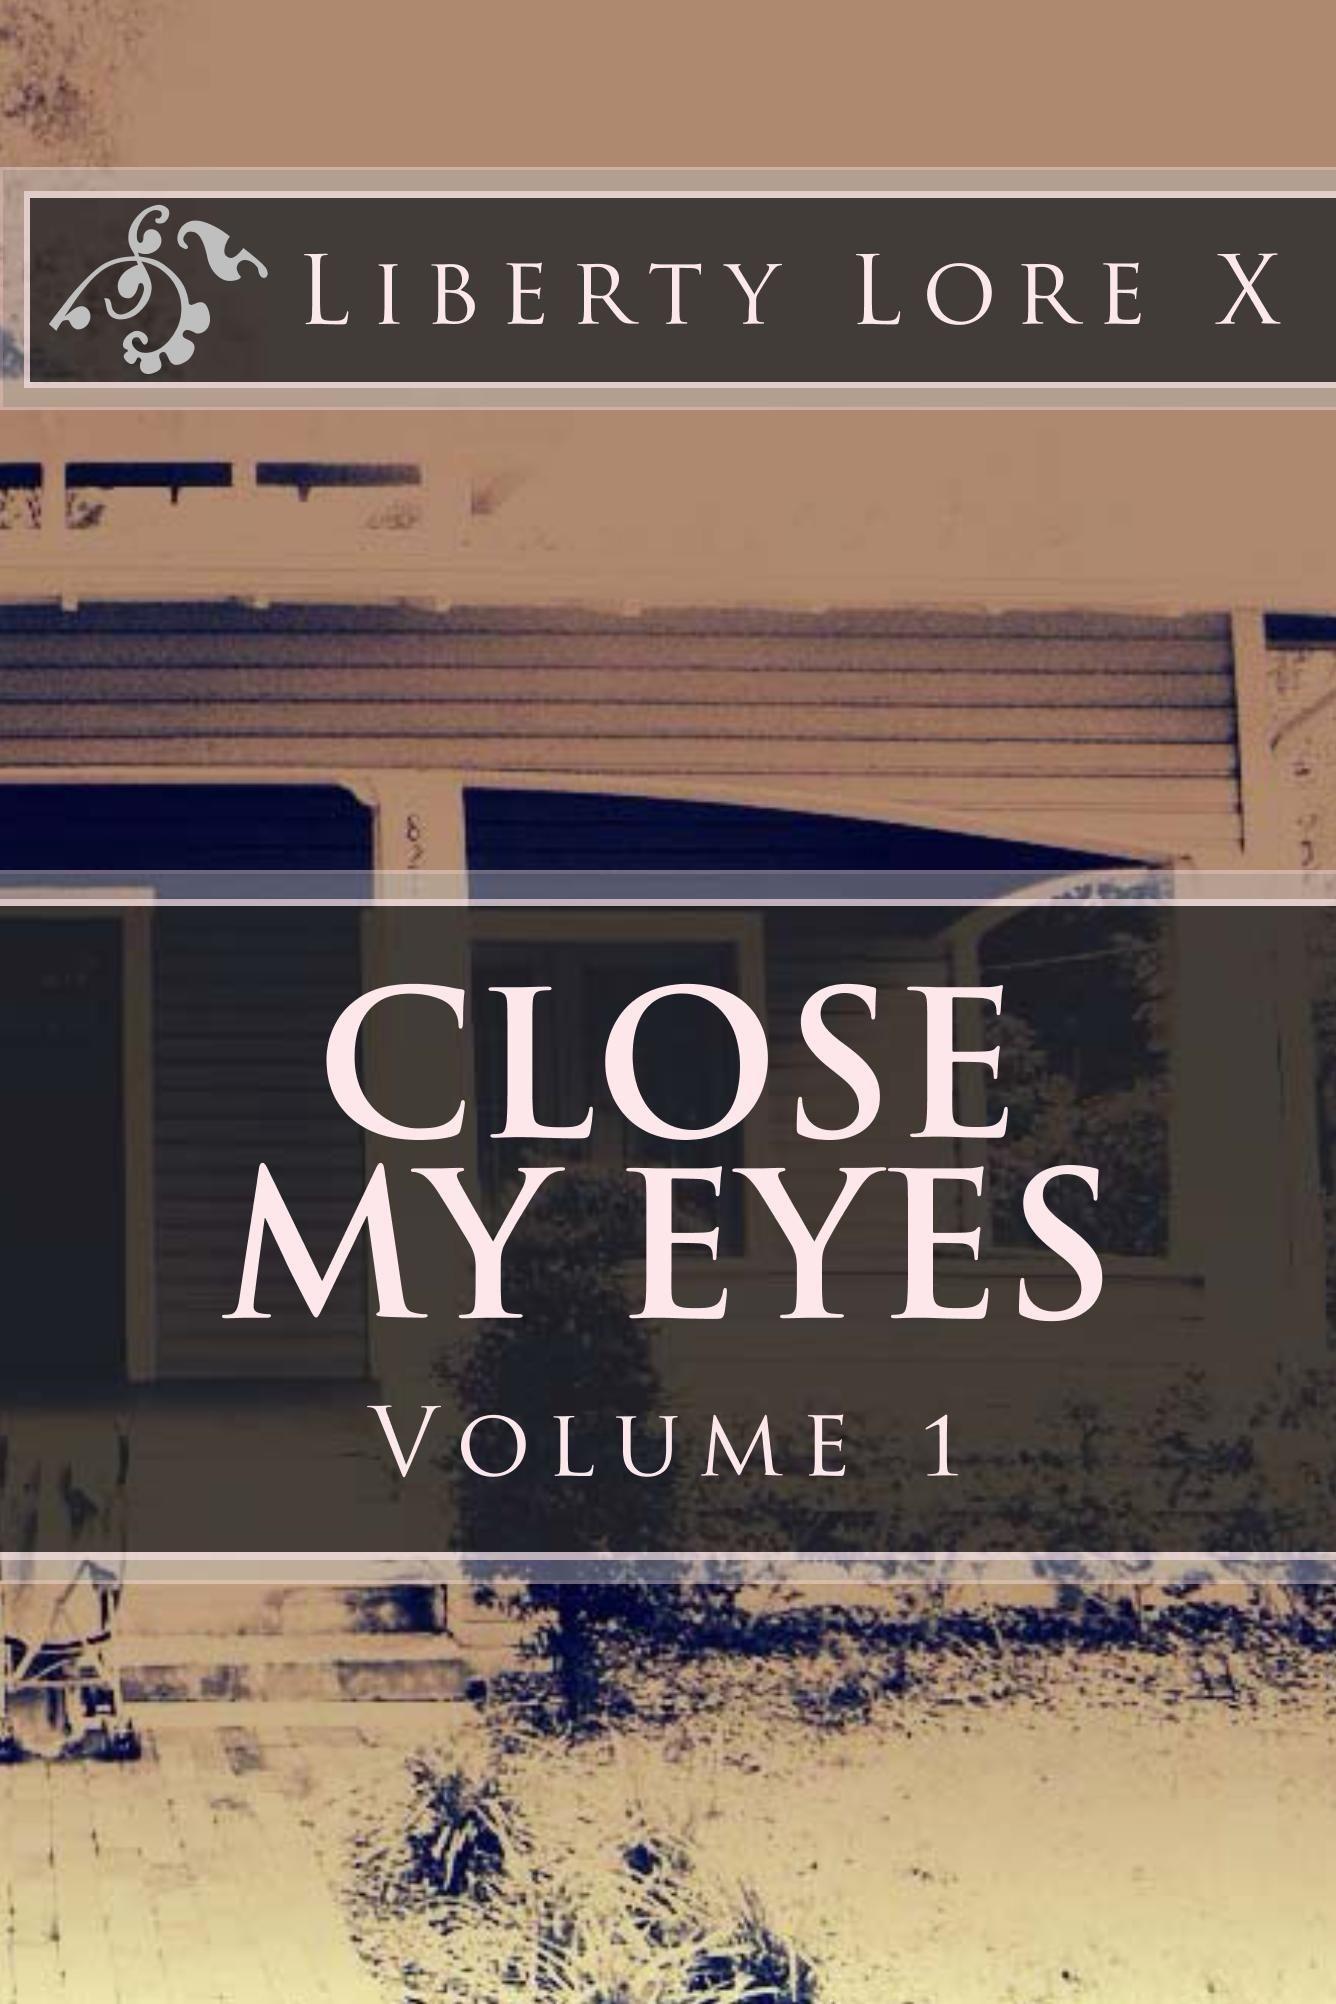 buy on amazon http://www.amazon.com/Close-My-Eyes-Wayward-Child-ebook/dp/B00GJXA1DI/ref=sr_1_2?s=digital-text&ie=UTF8&qid=1384095193&sr=1-2&keywords=close+my+eyes  #ebook #reading #love #heartache #comingofage #books